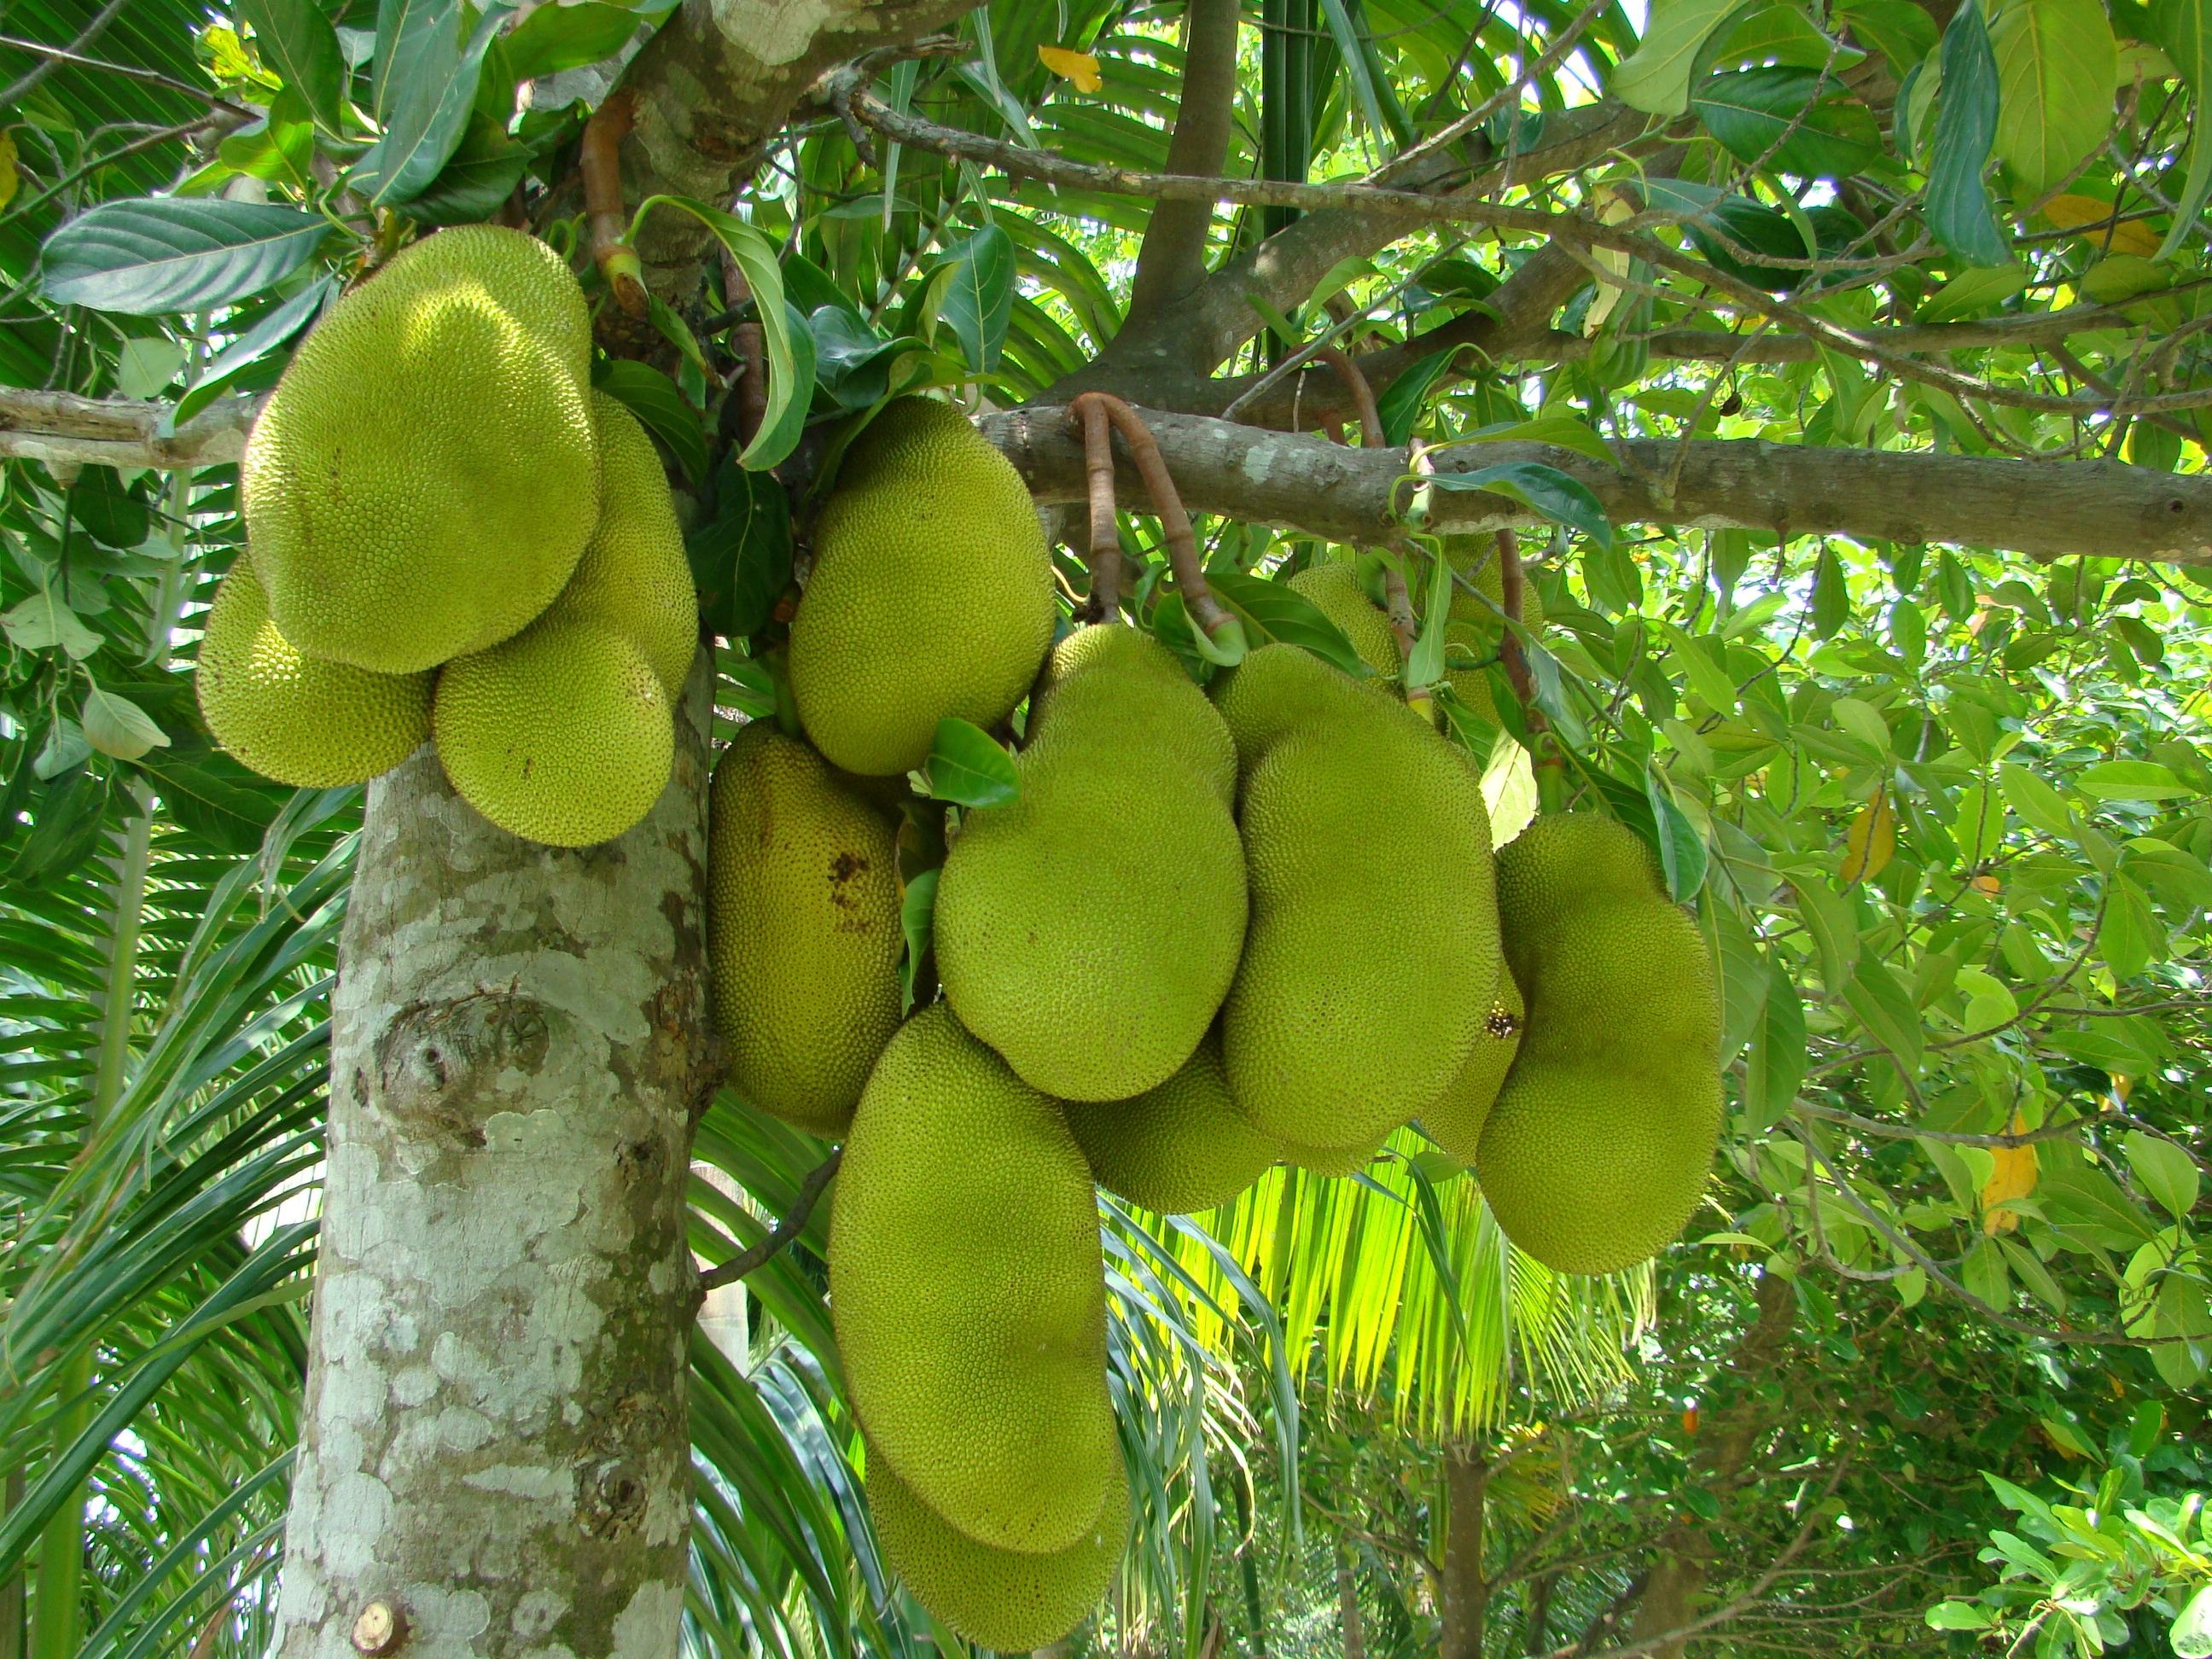 jackfruit background history and origin unique fruit